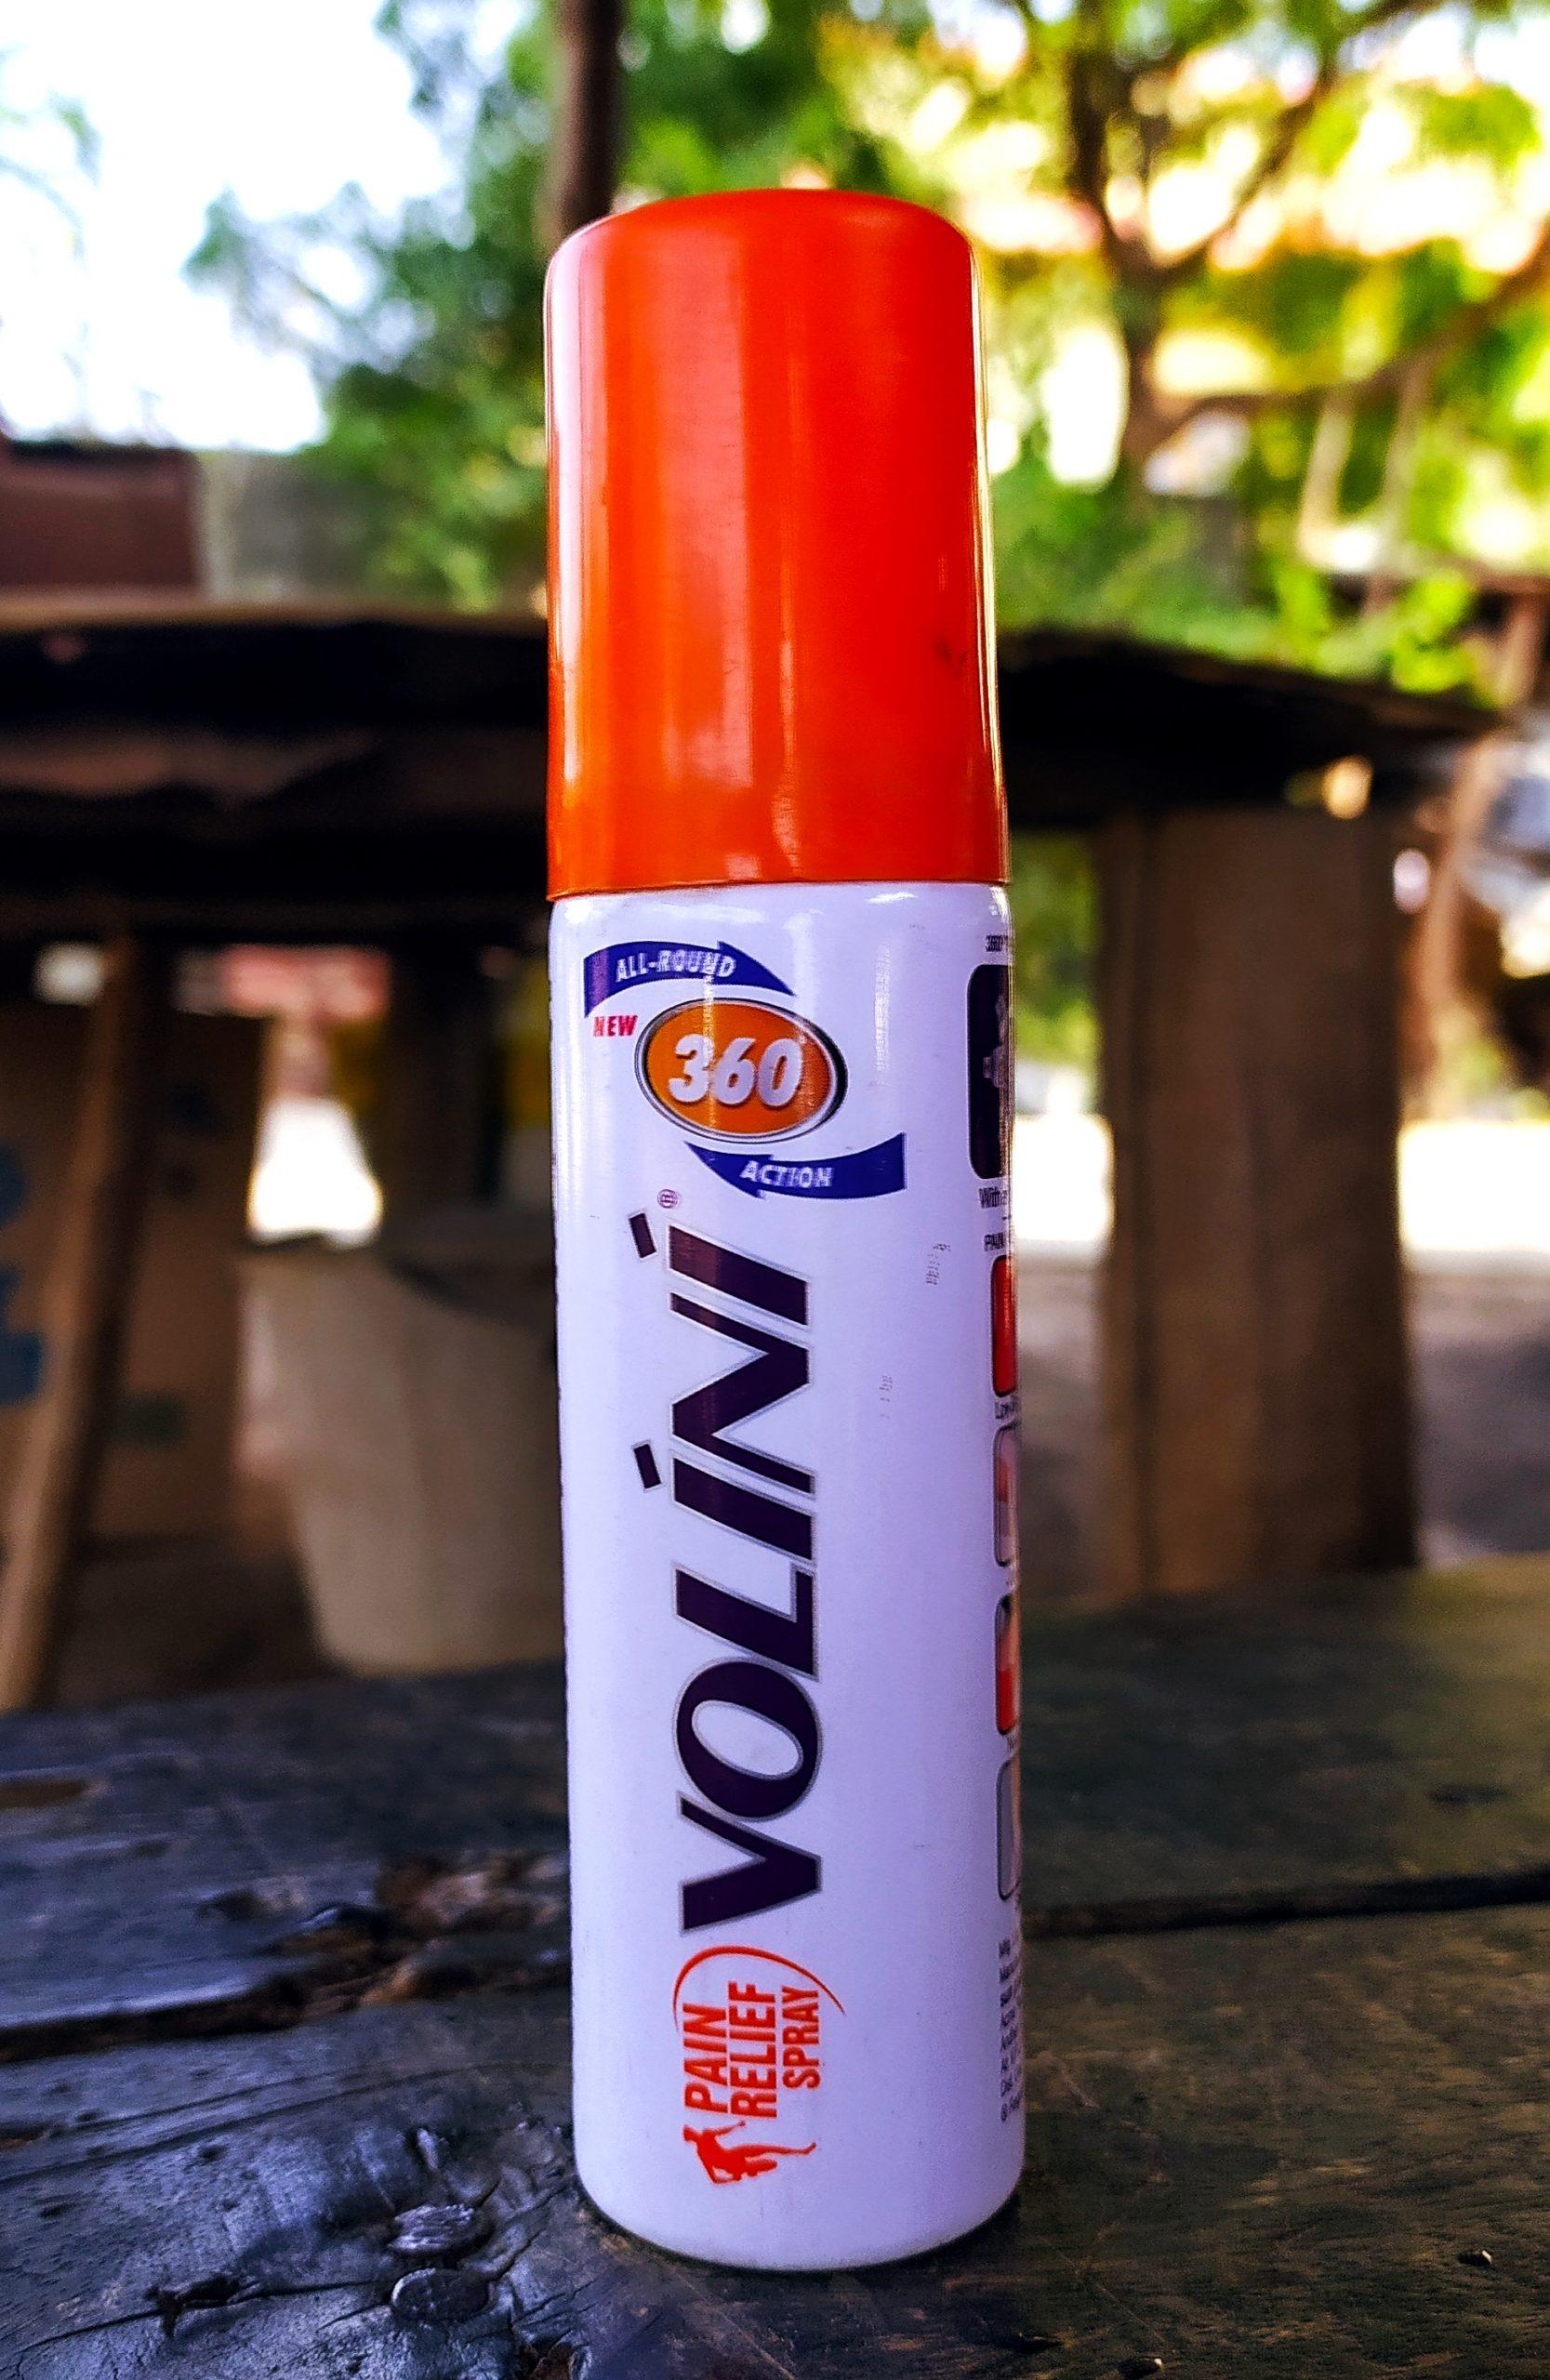 Volini spray bottle